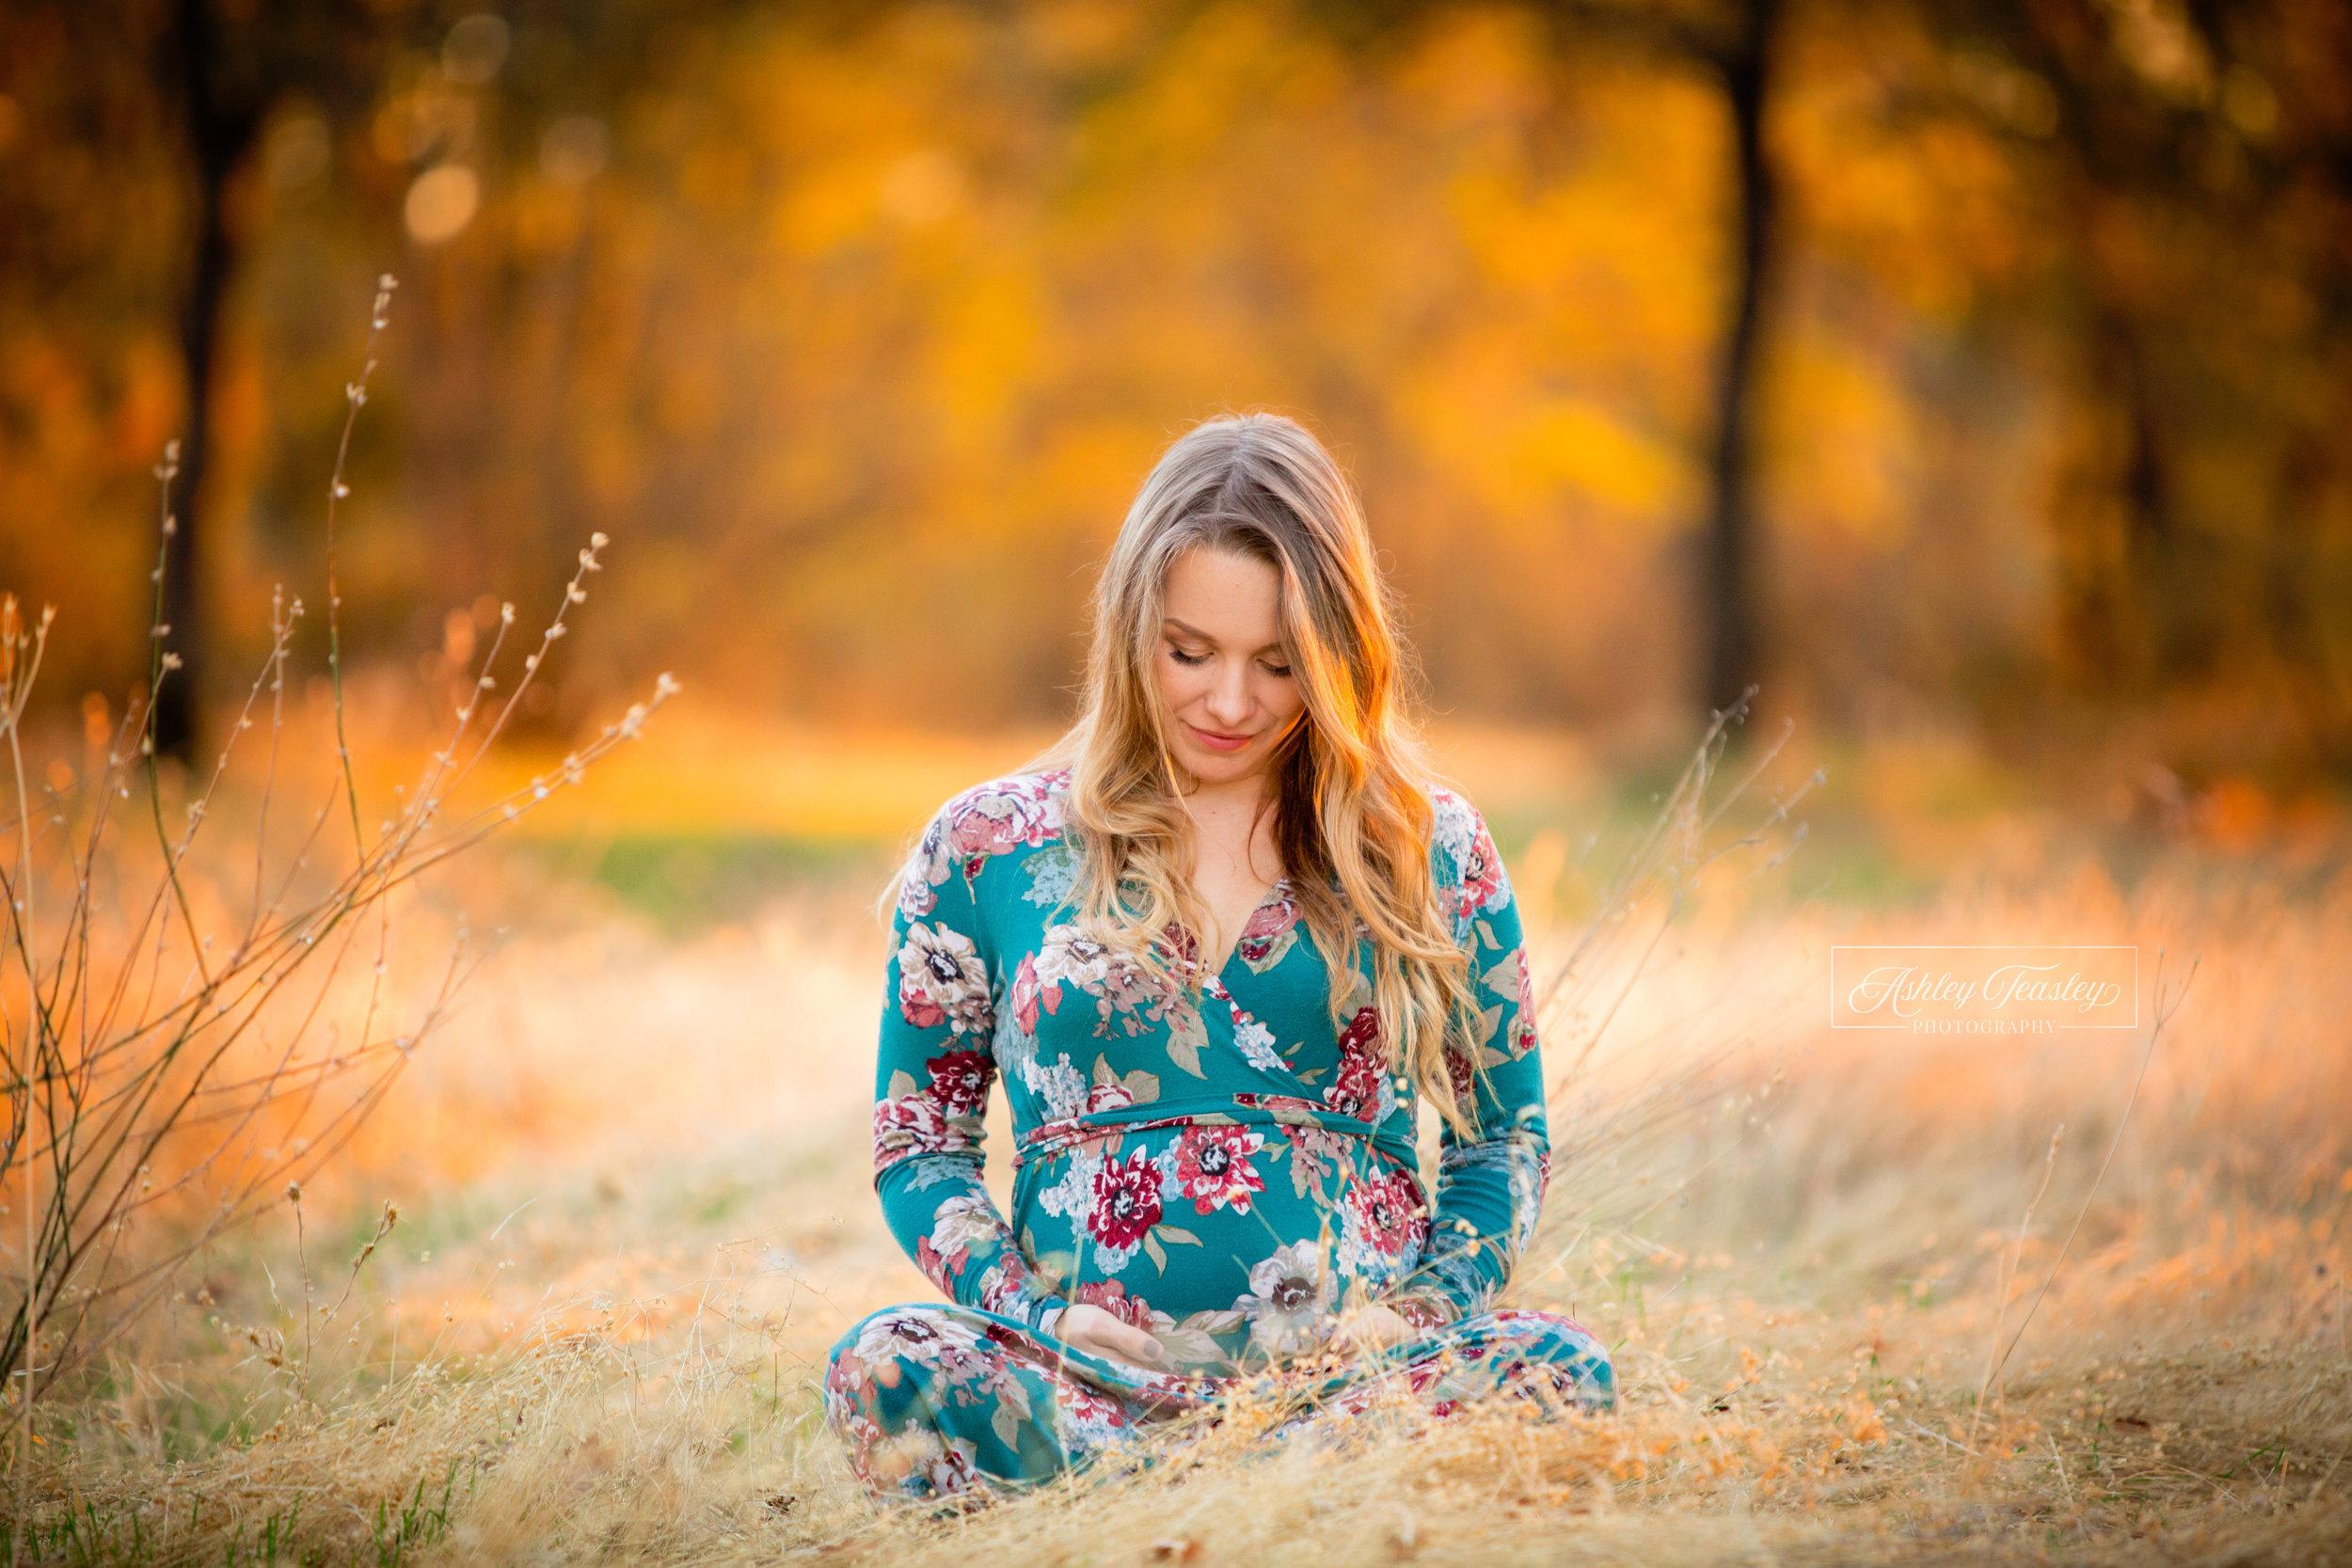 Family Session - Maternity Session - Sacramento Wedding Photographer - Ashley Teasley Photography-62.jpg